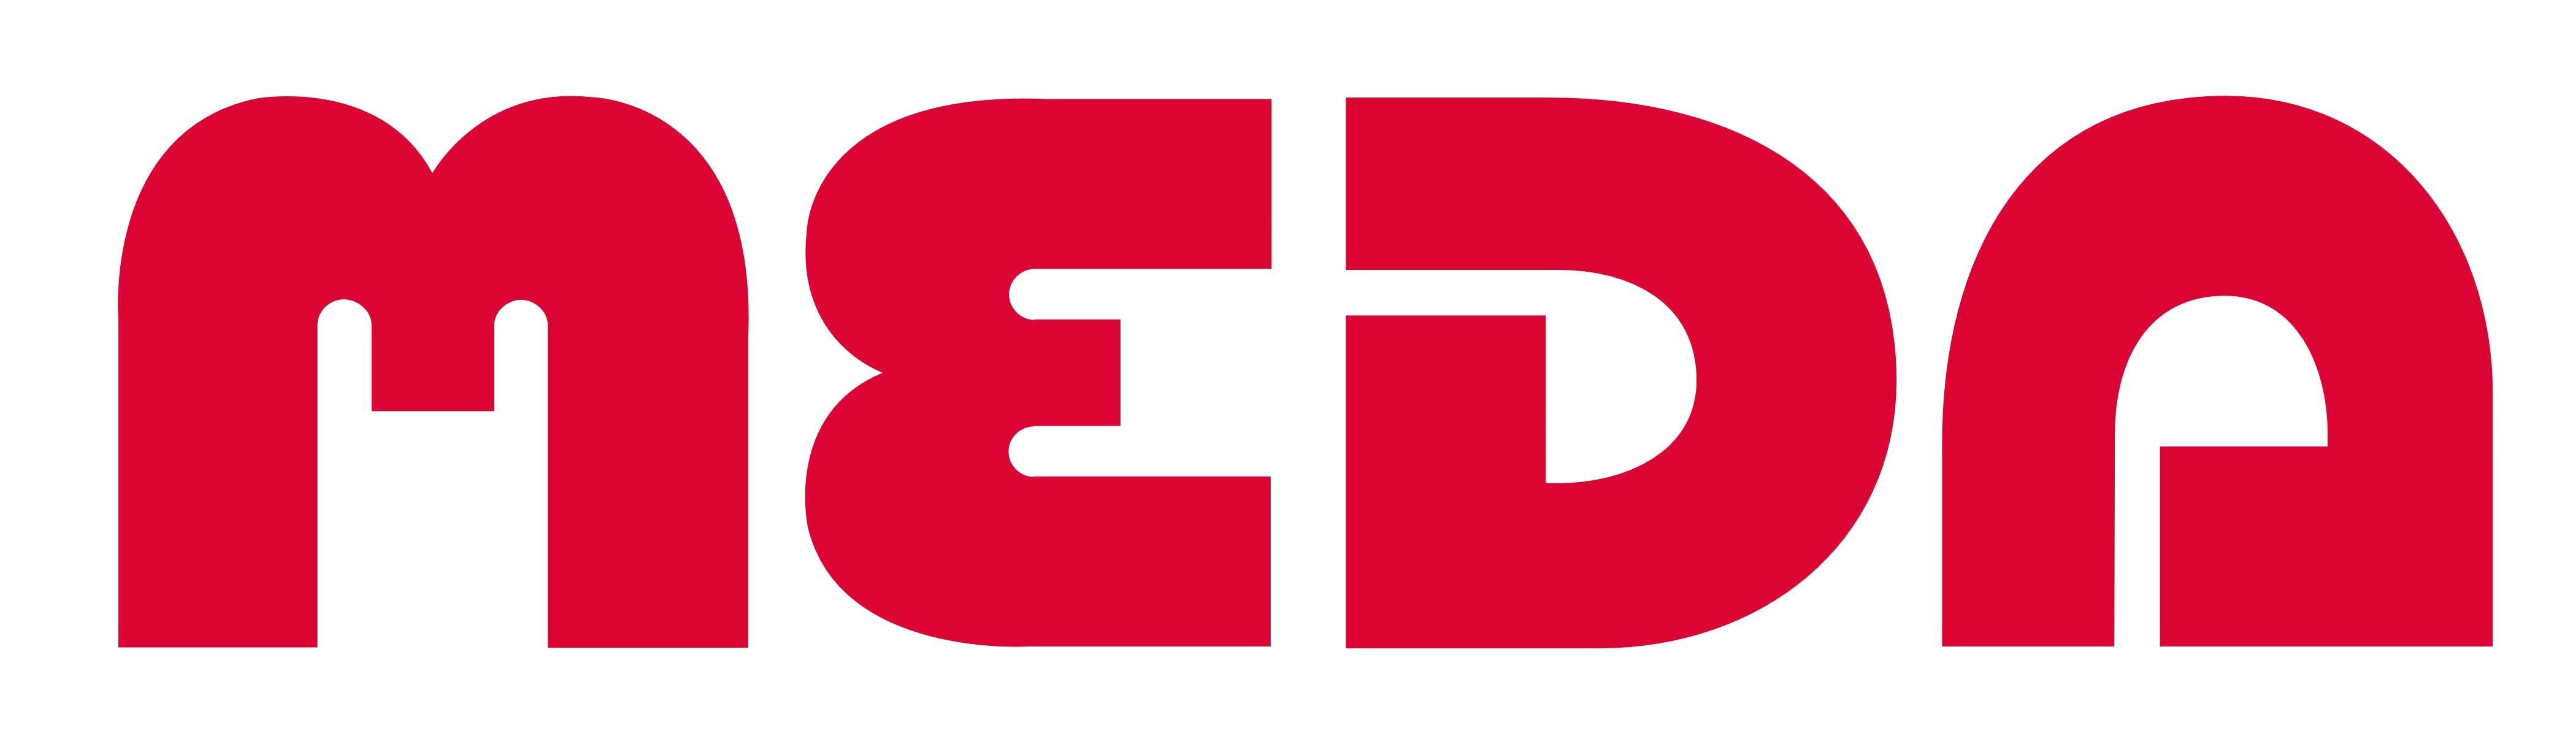 Meda Logos Download